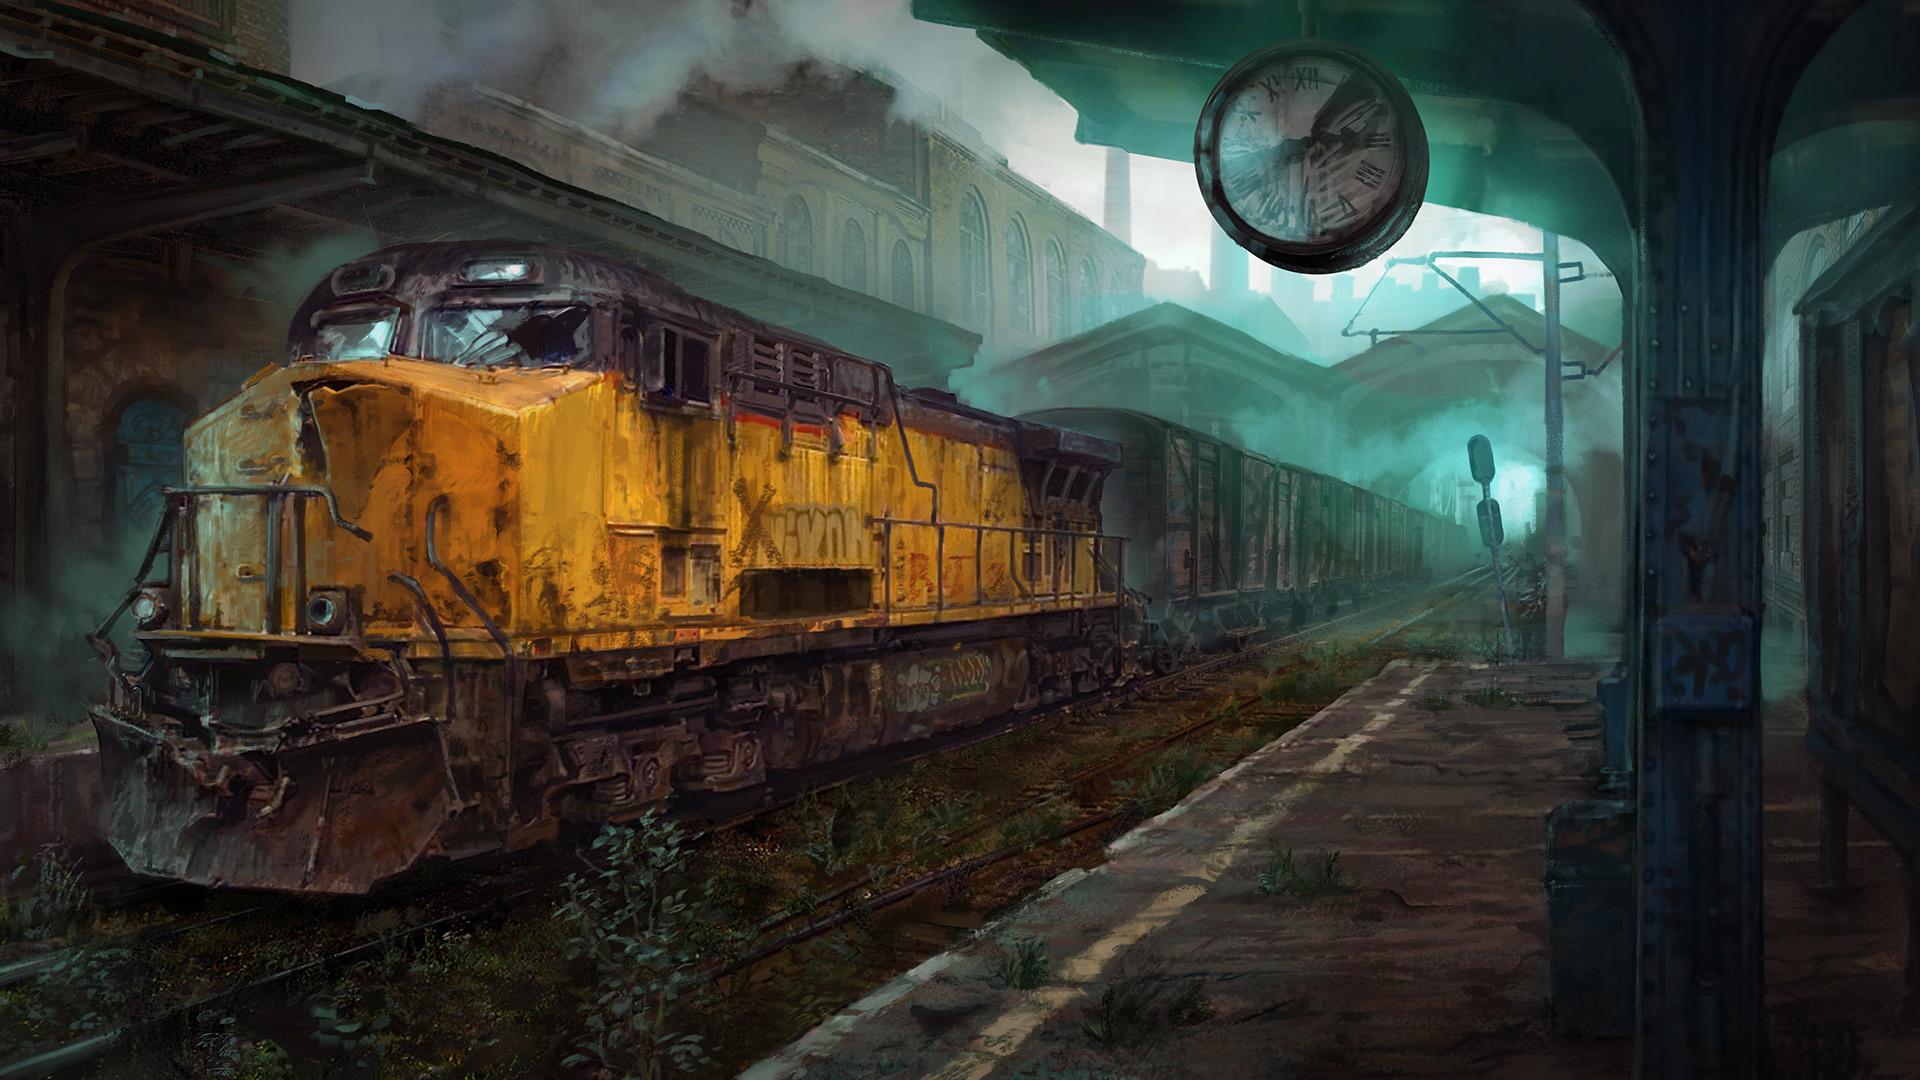 Train Station Renovation вышла в раннем доступе Steam